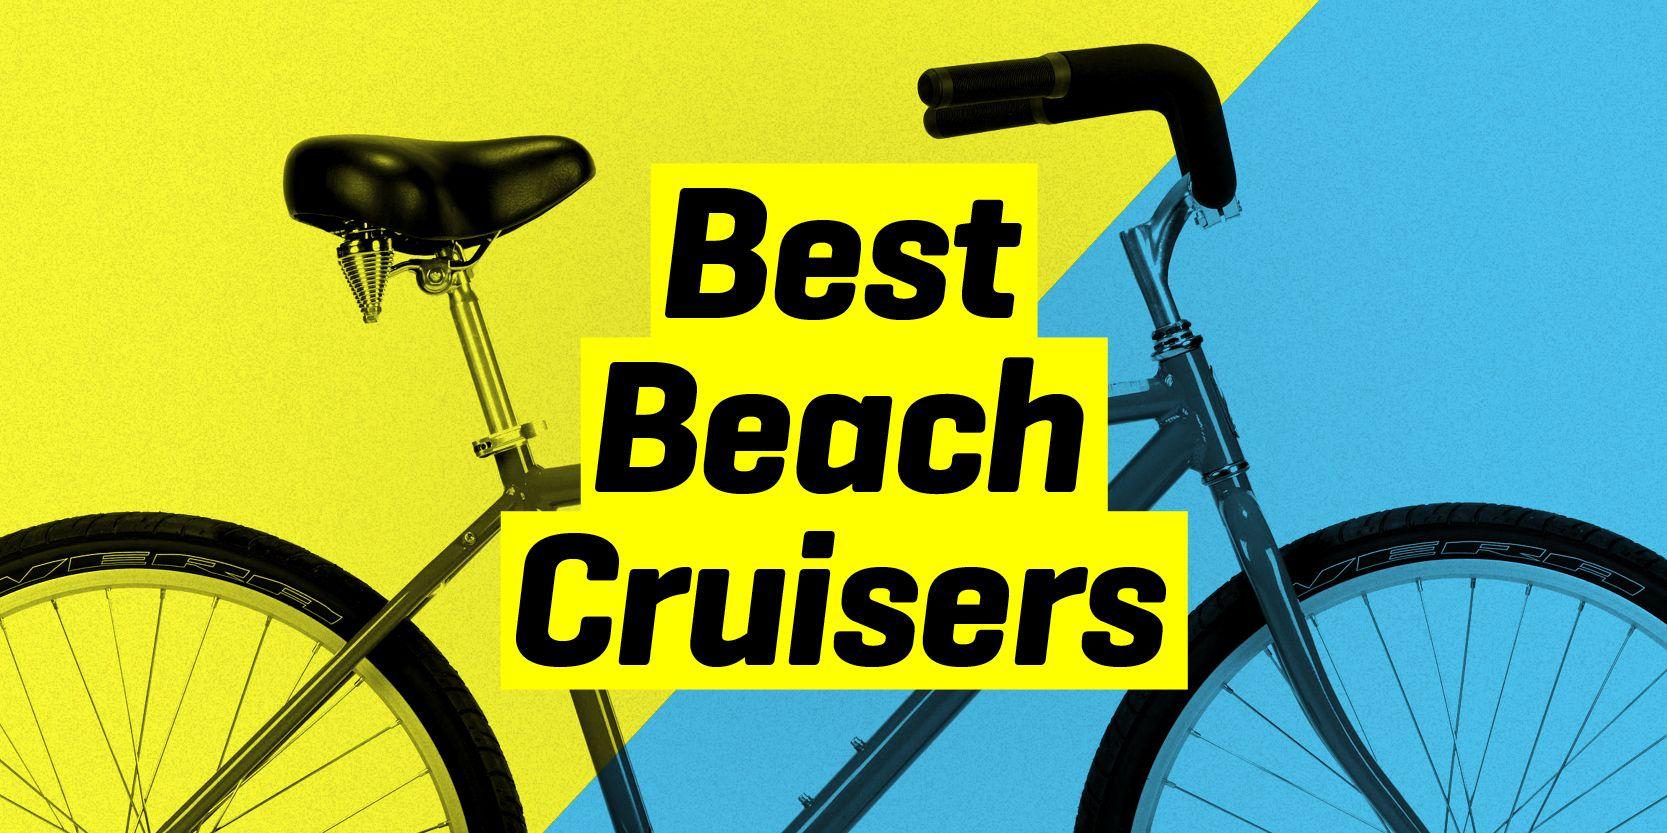 Beach Cruisers Lead Image